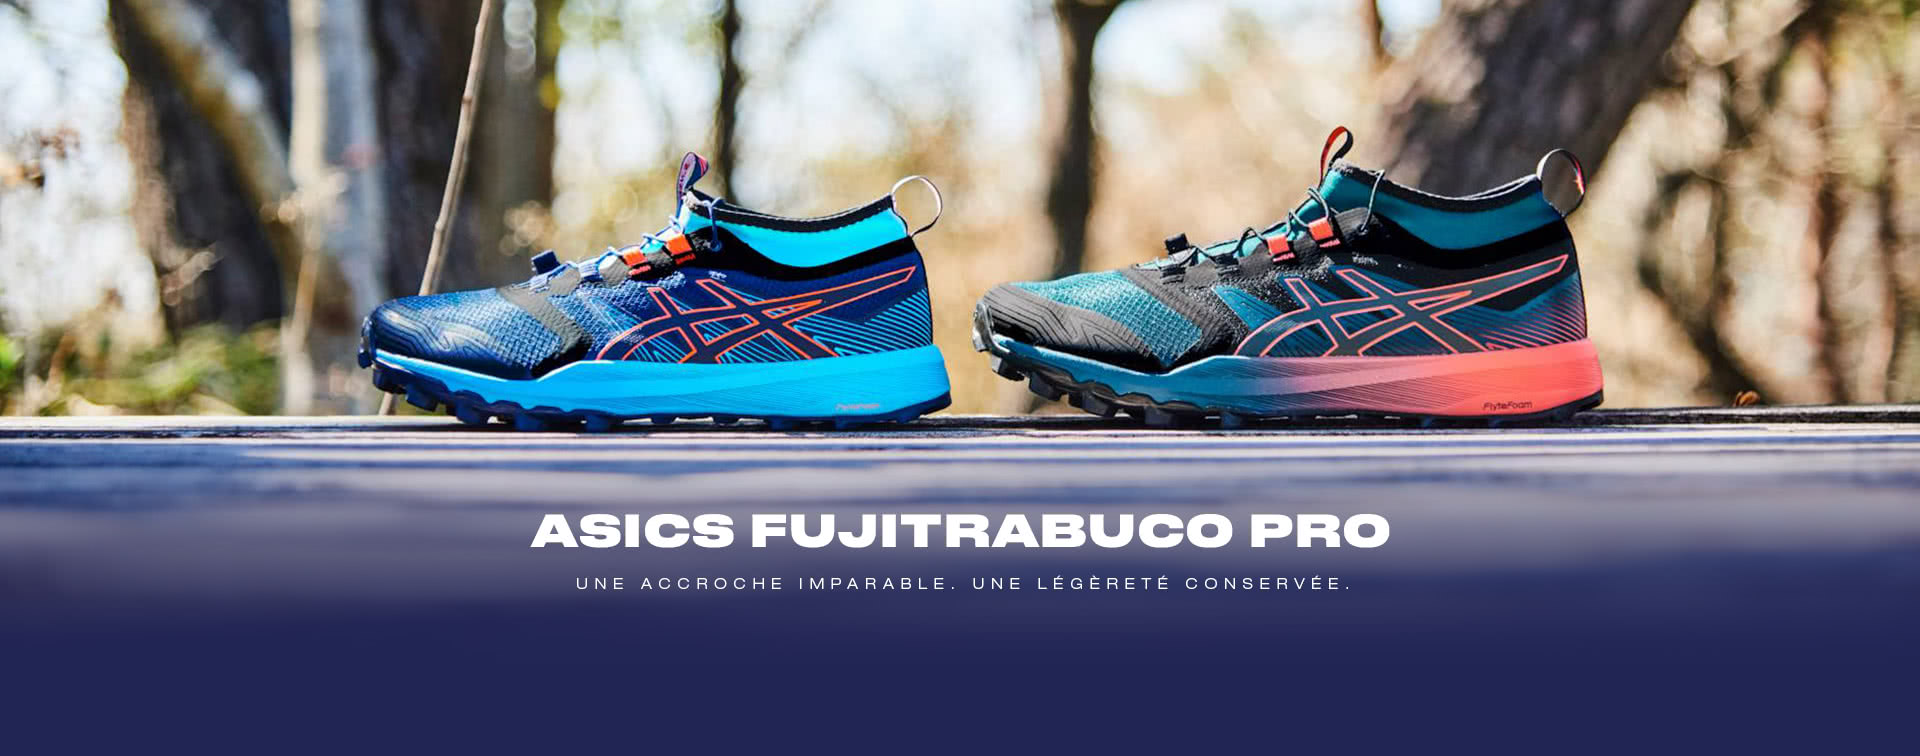 Chaussures de training Asics